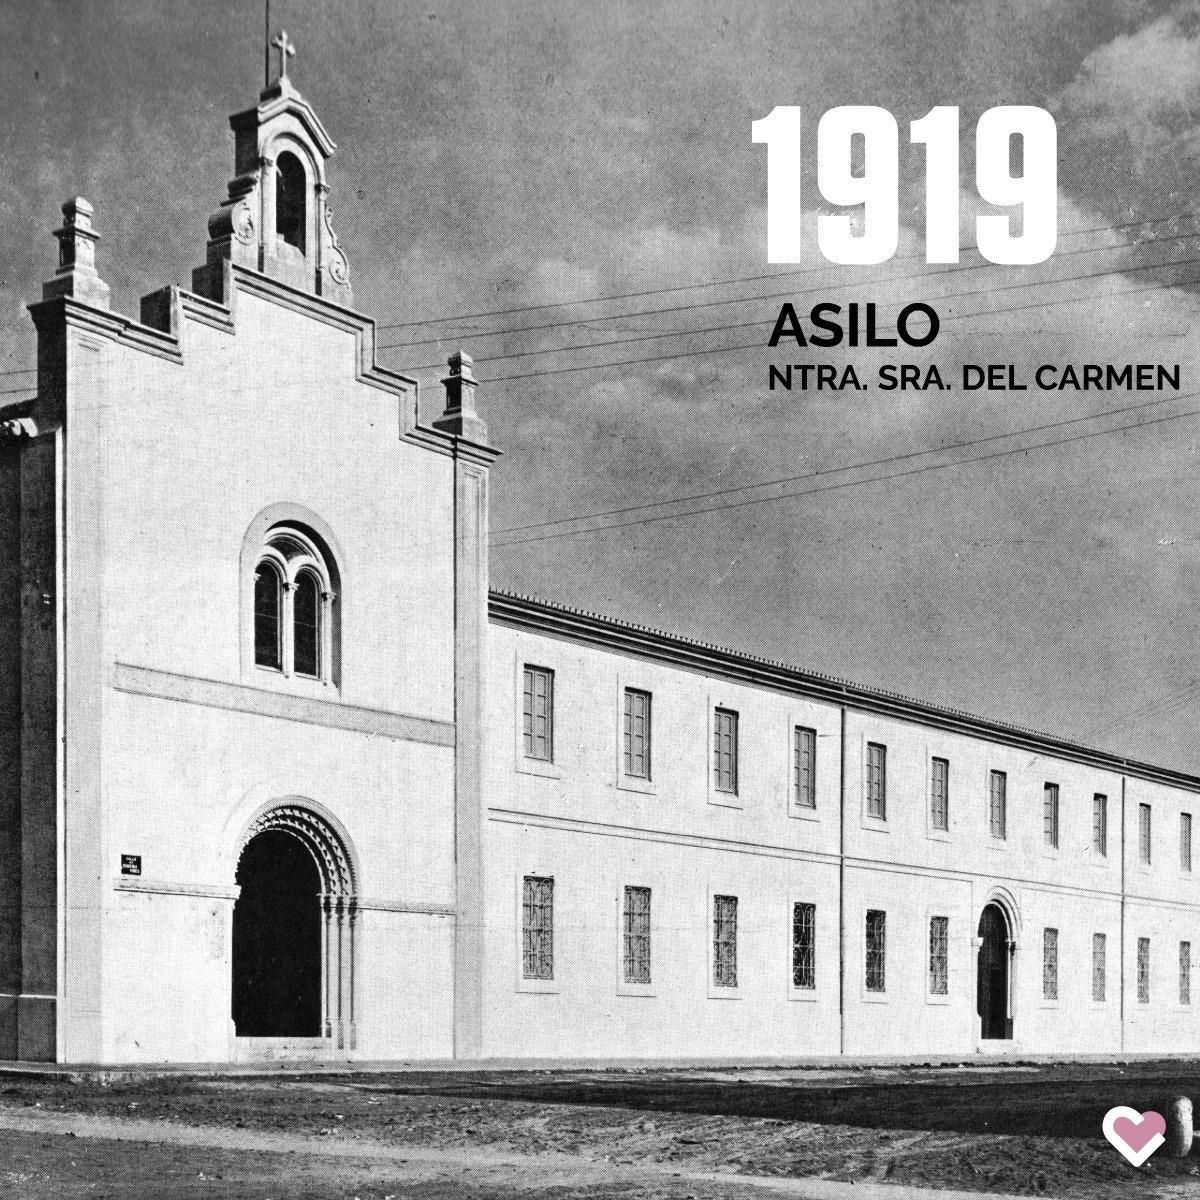 Fachada Asilo Ntra. Sra. del Carmen, 1919